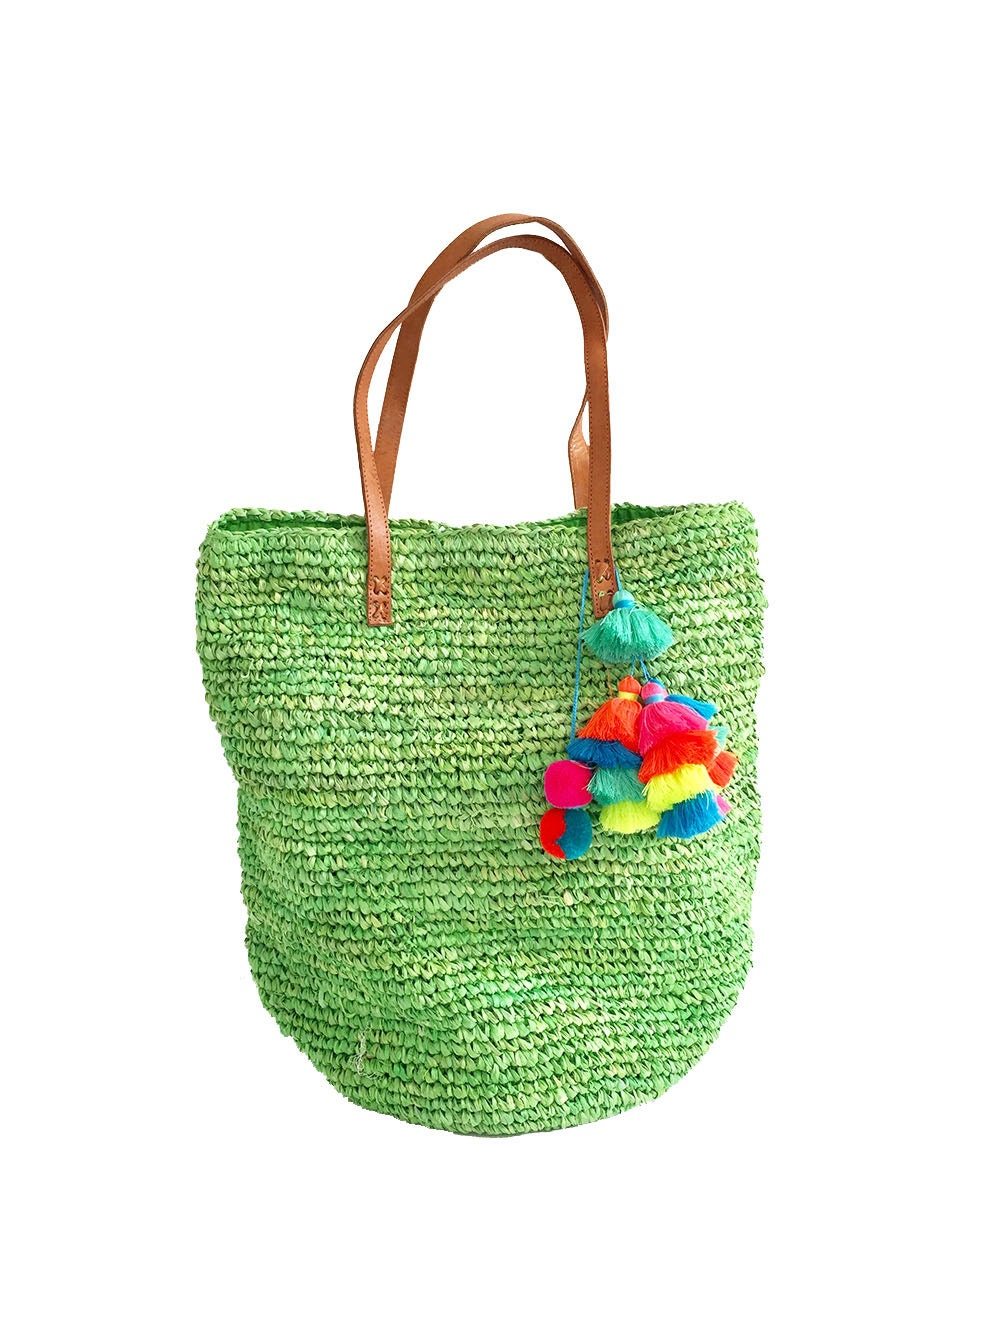 handwoven bag straw tote straw bagbeach bags tassel